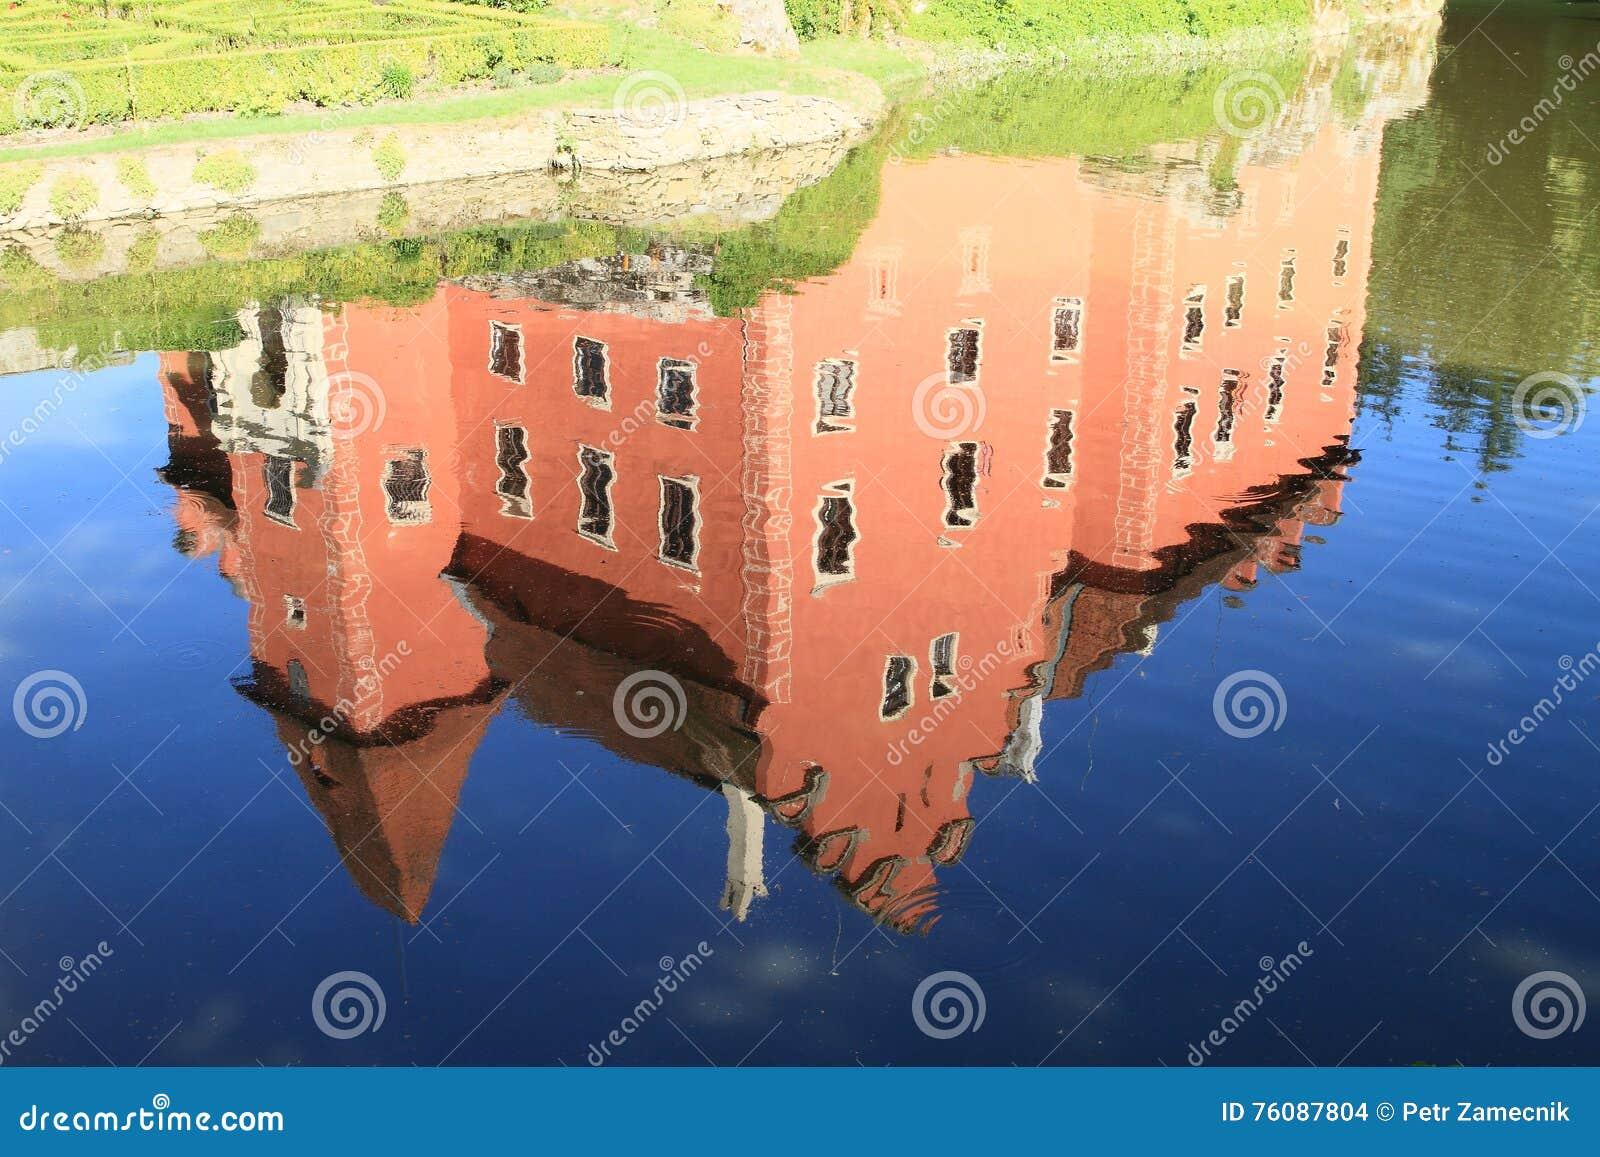 Refléter du château Cervena Lhota